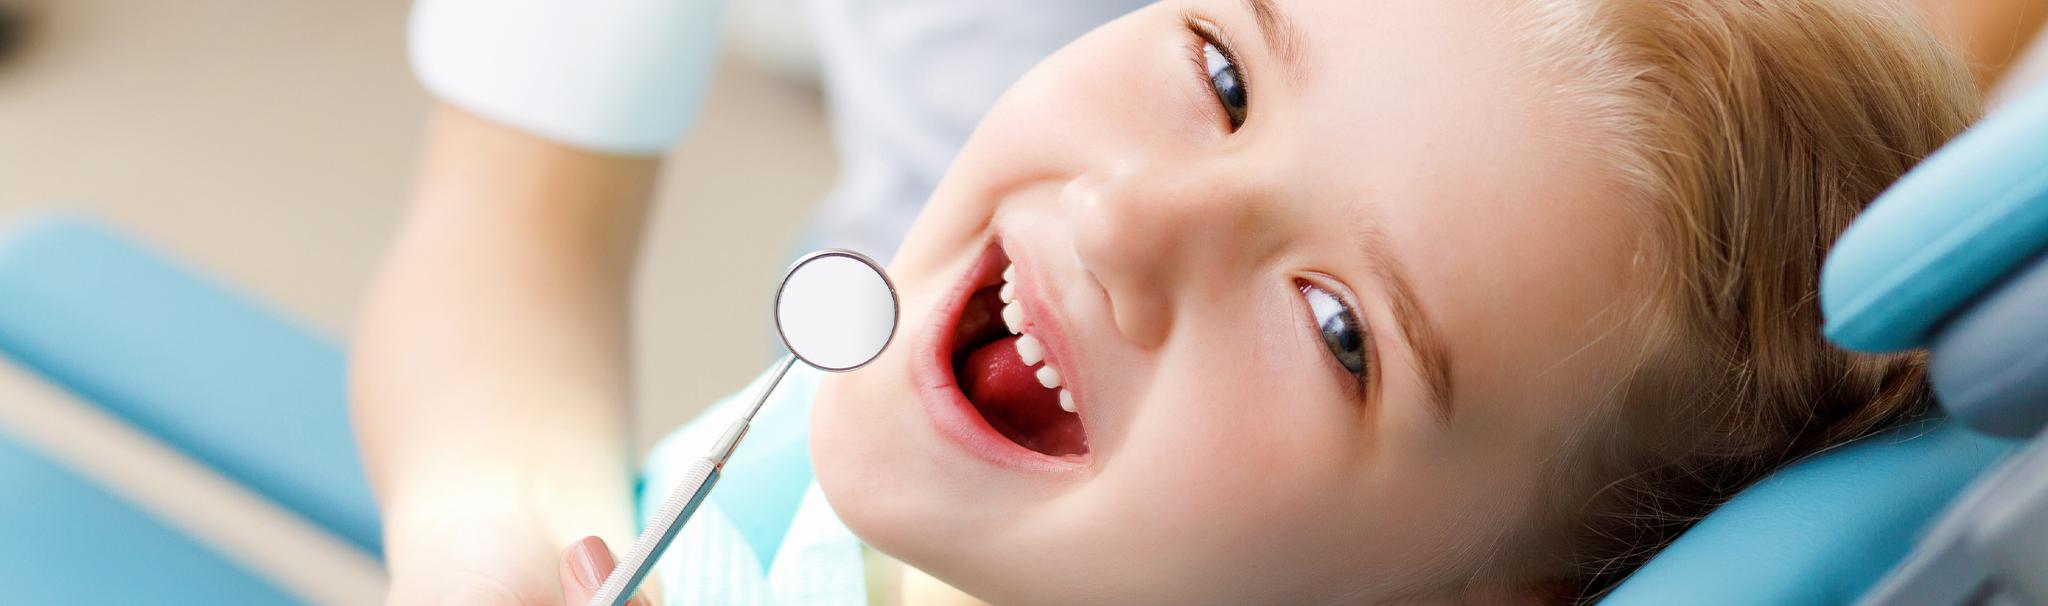 child at a dental exam